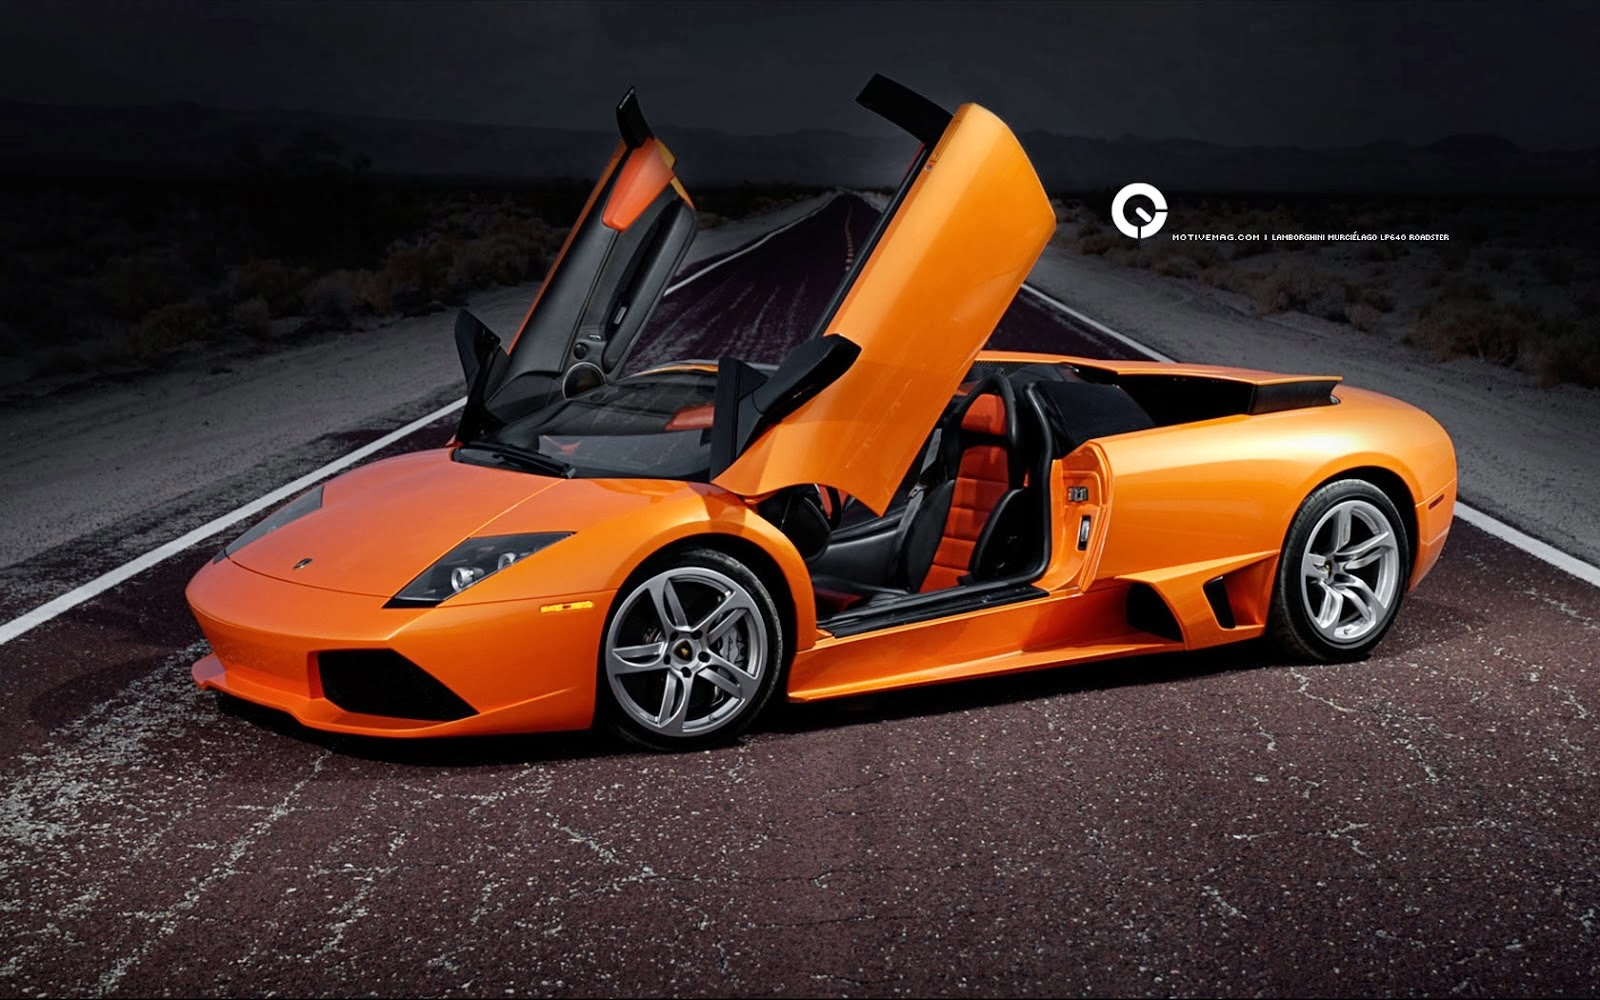 Free Download Gallardo Hd Wallpaper 1080p Lamborghini